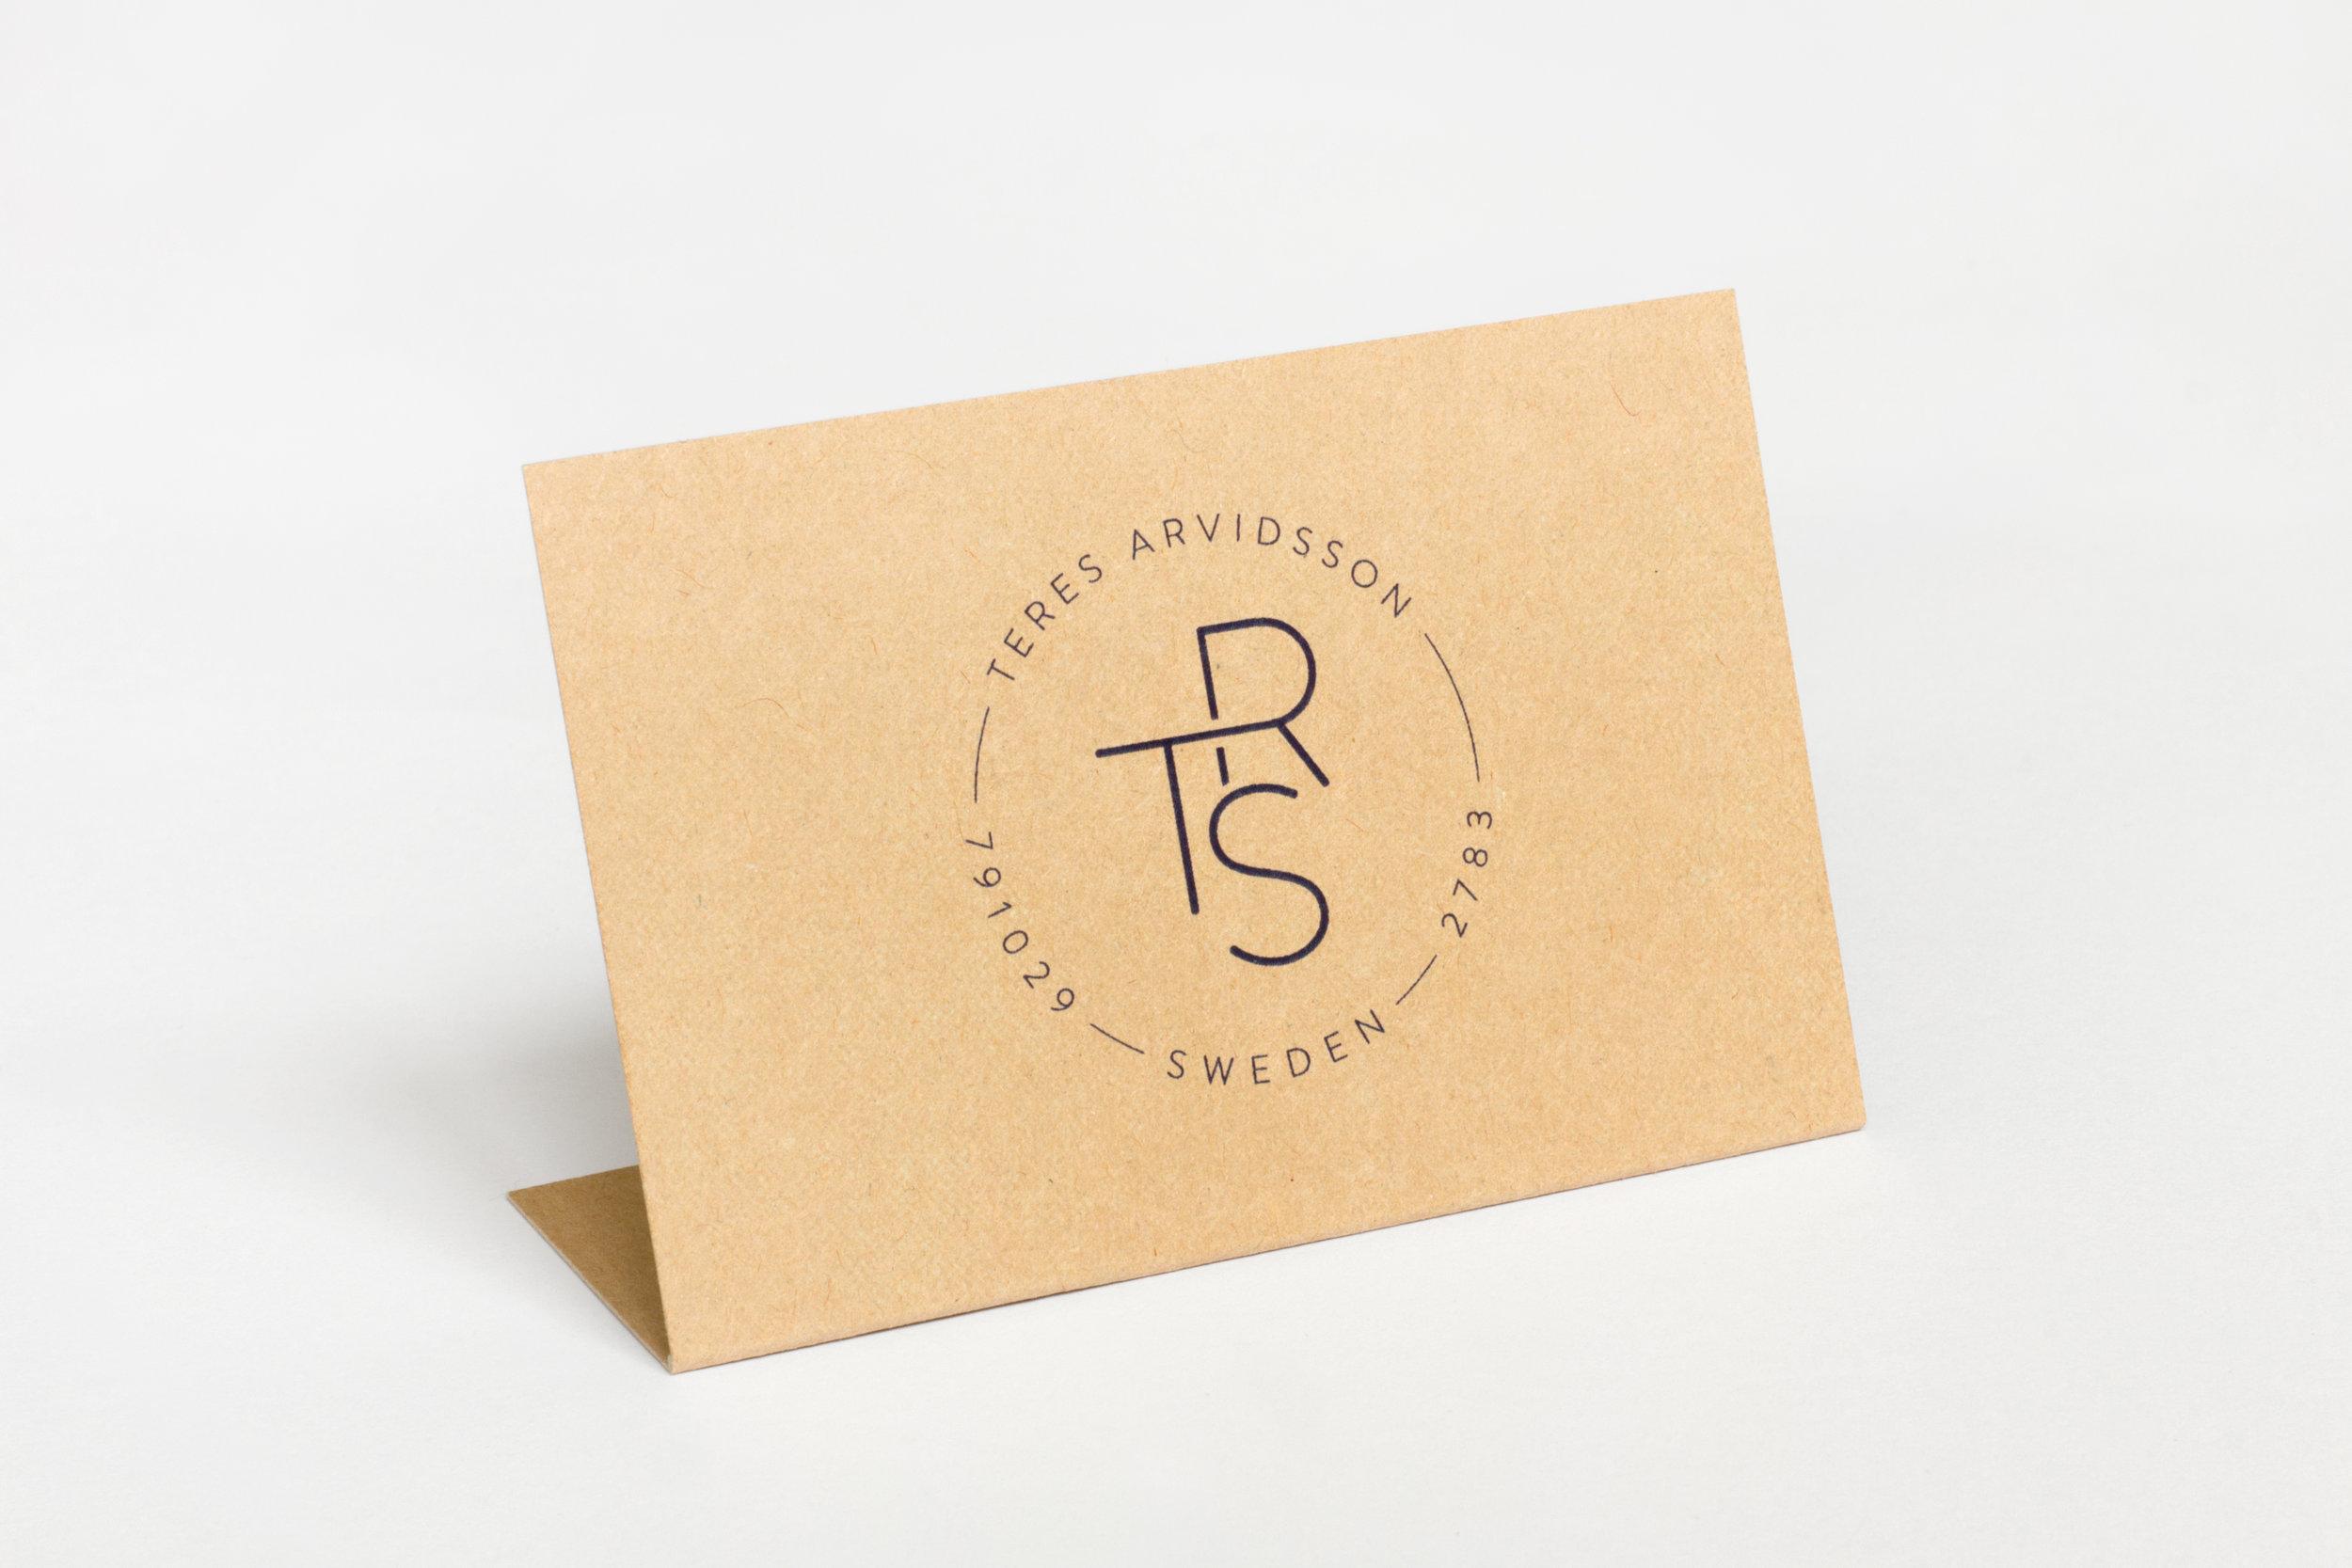 TeresArvidsson-Business card.jpg